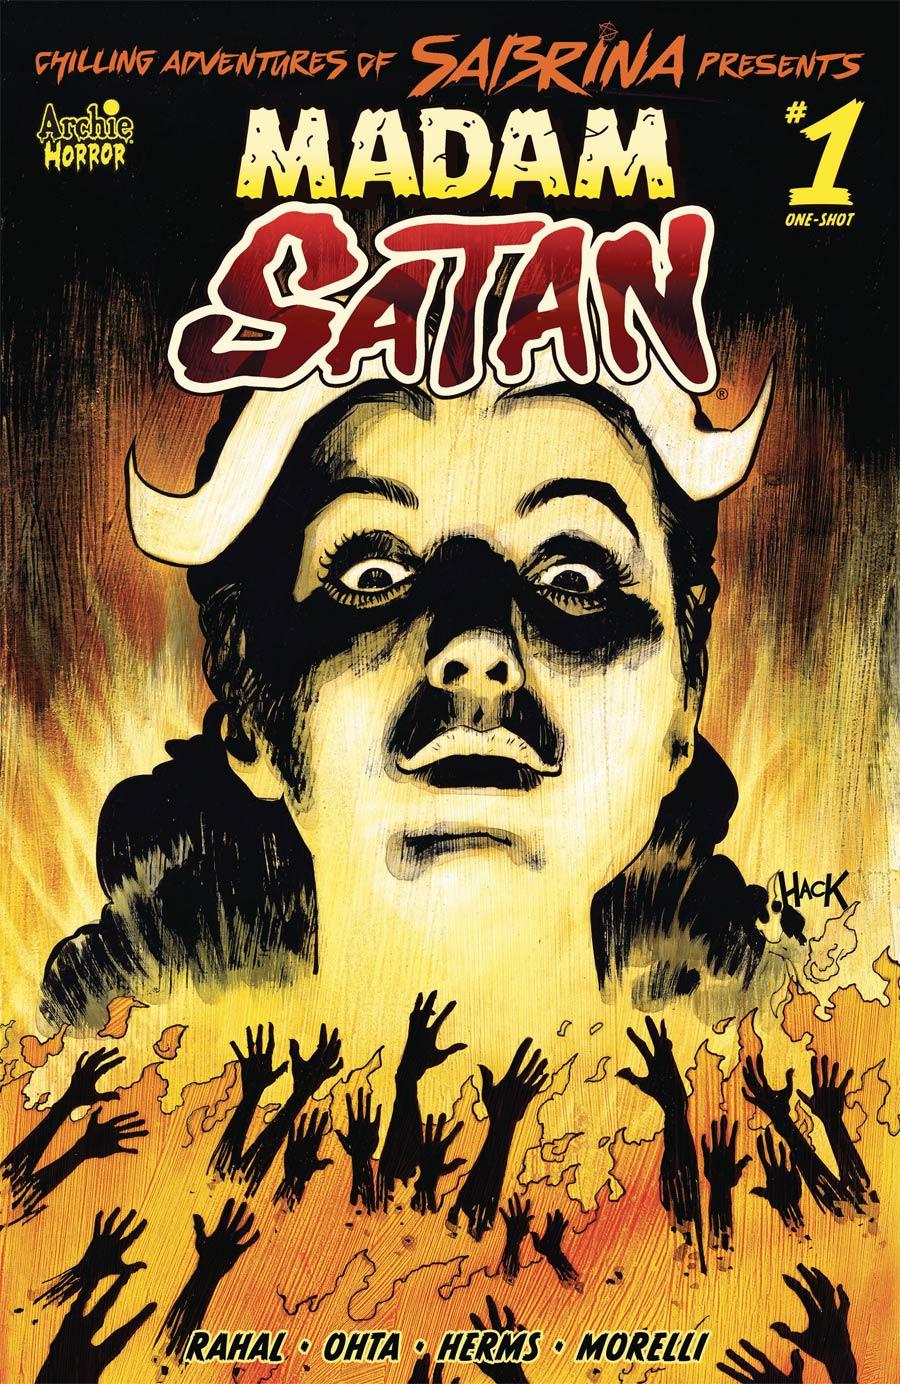 Chilling Adventures Of Sabrina Presents Madame Satan One Shot Cover B Variant Robert Hack Cover